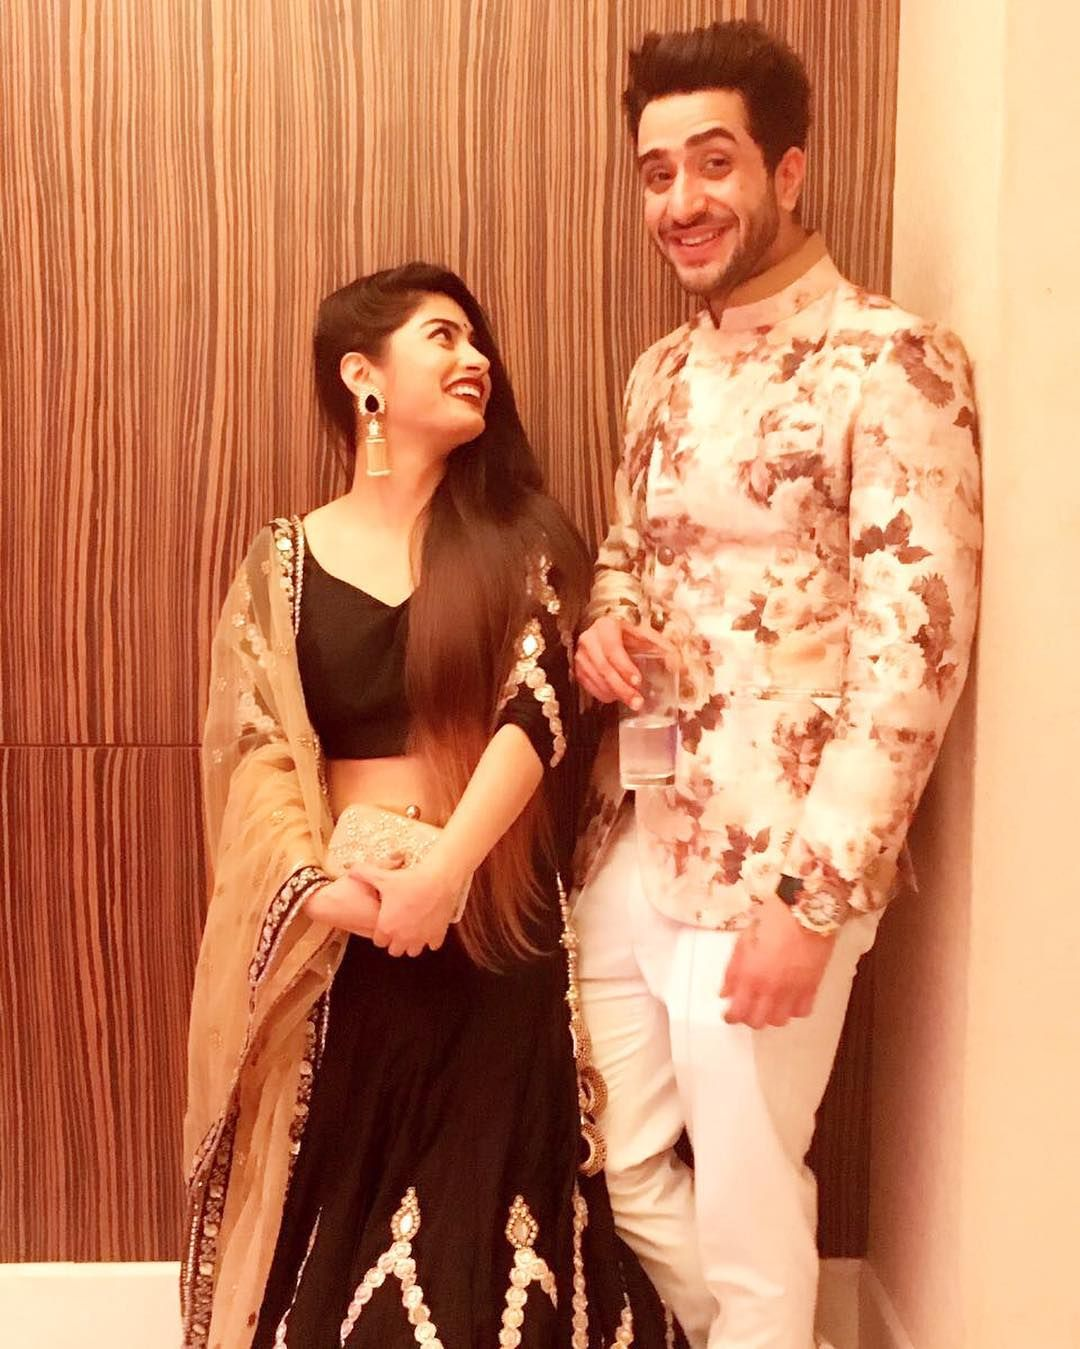 krishna mukherjee datinghook up with bridesmaid